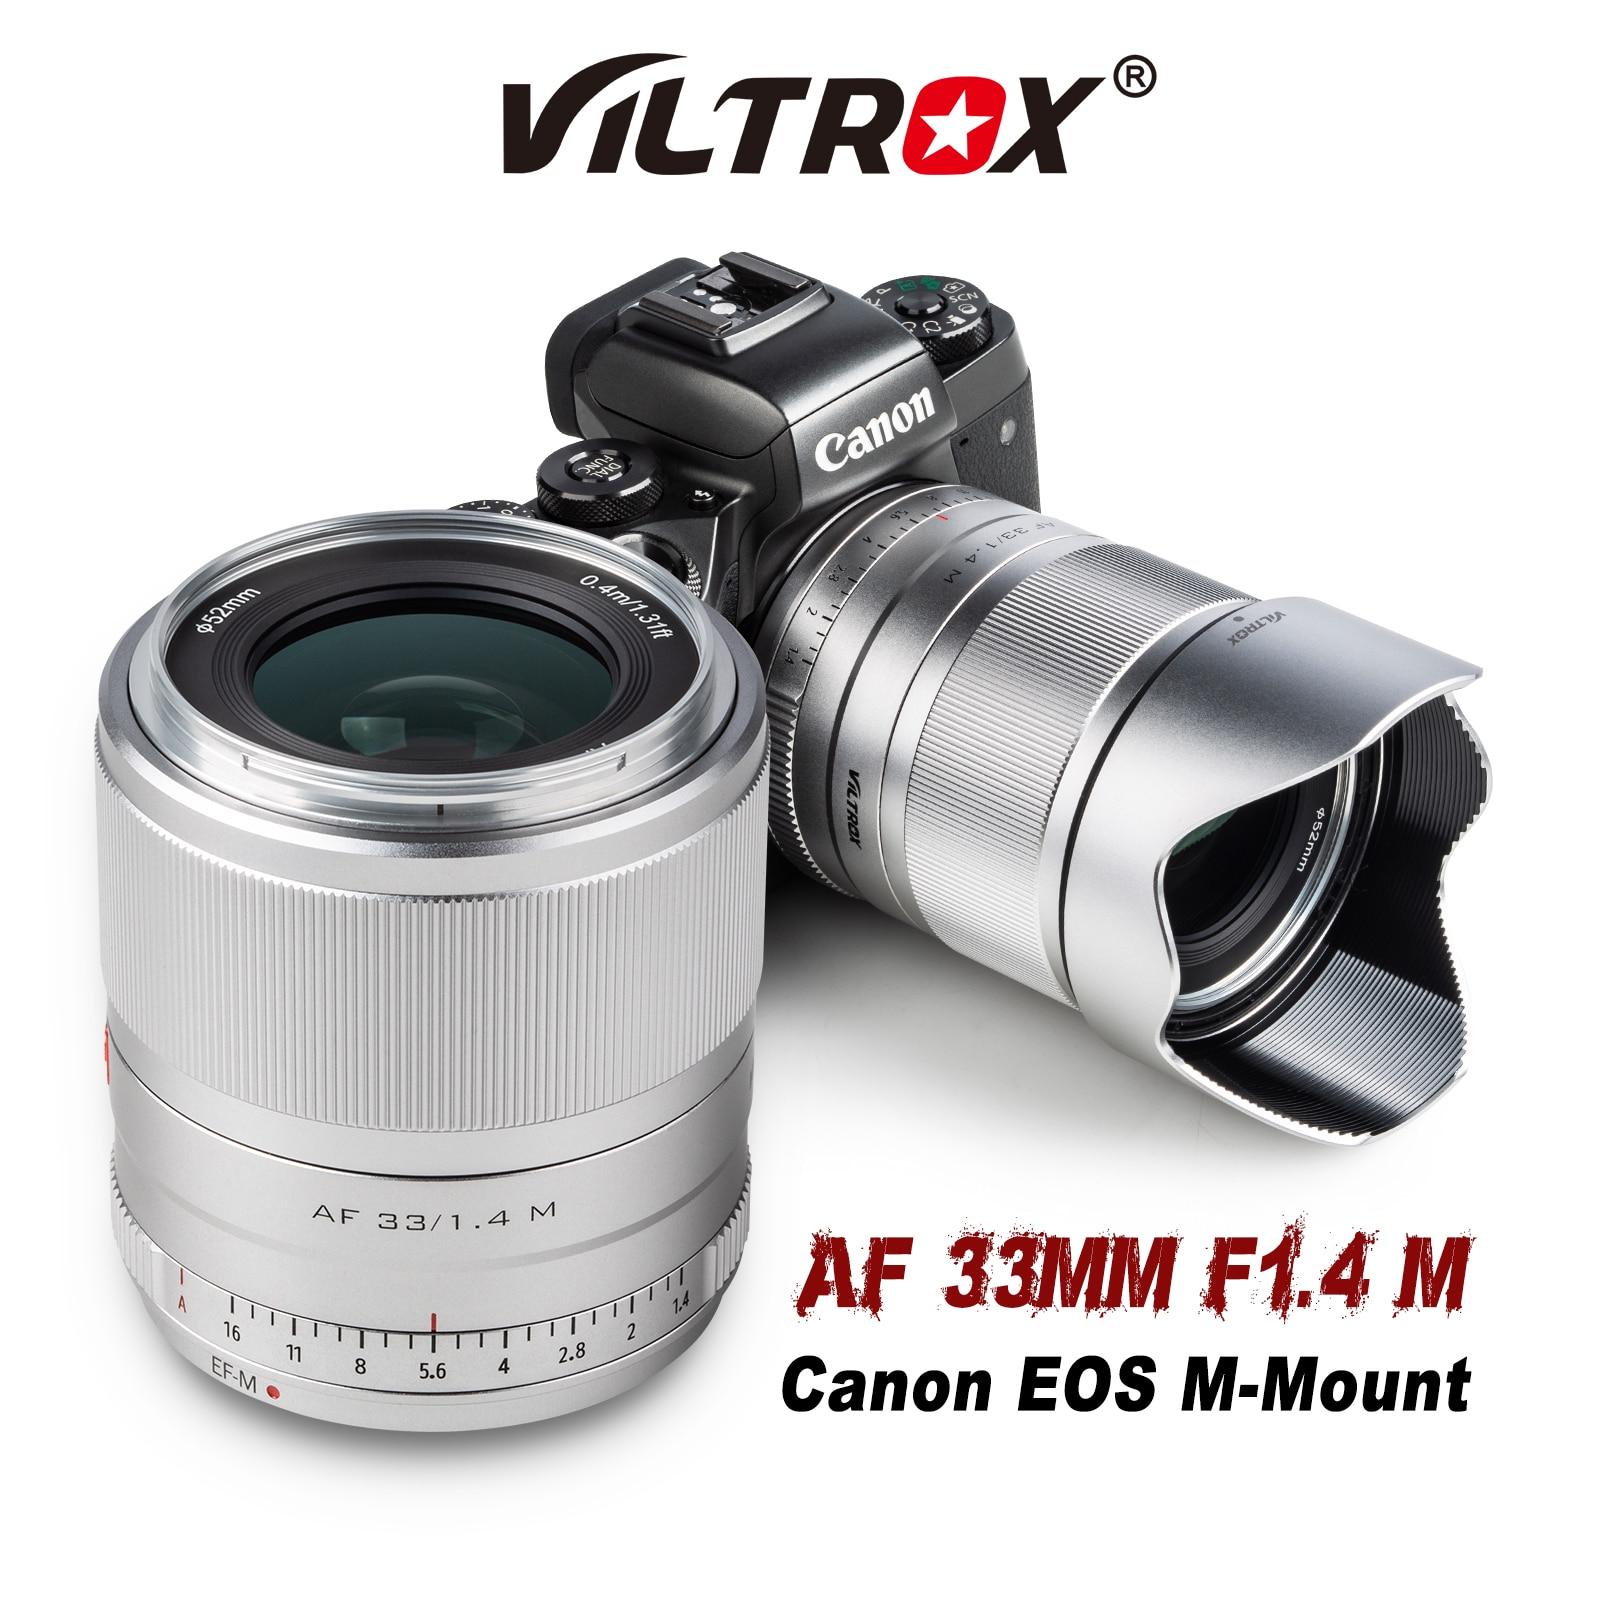 Viltrox 33 مللي متر f1.4 STM عدسة الكاميرا السيارات التركيز رئيس APS-C لكانون EOS متر جبل EF-M عدسة M5 M6 مارك II M200 M50 M100